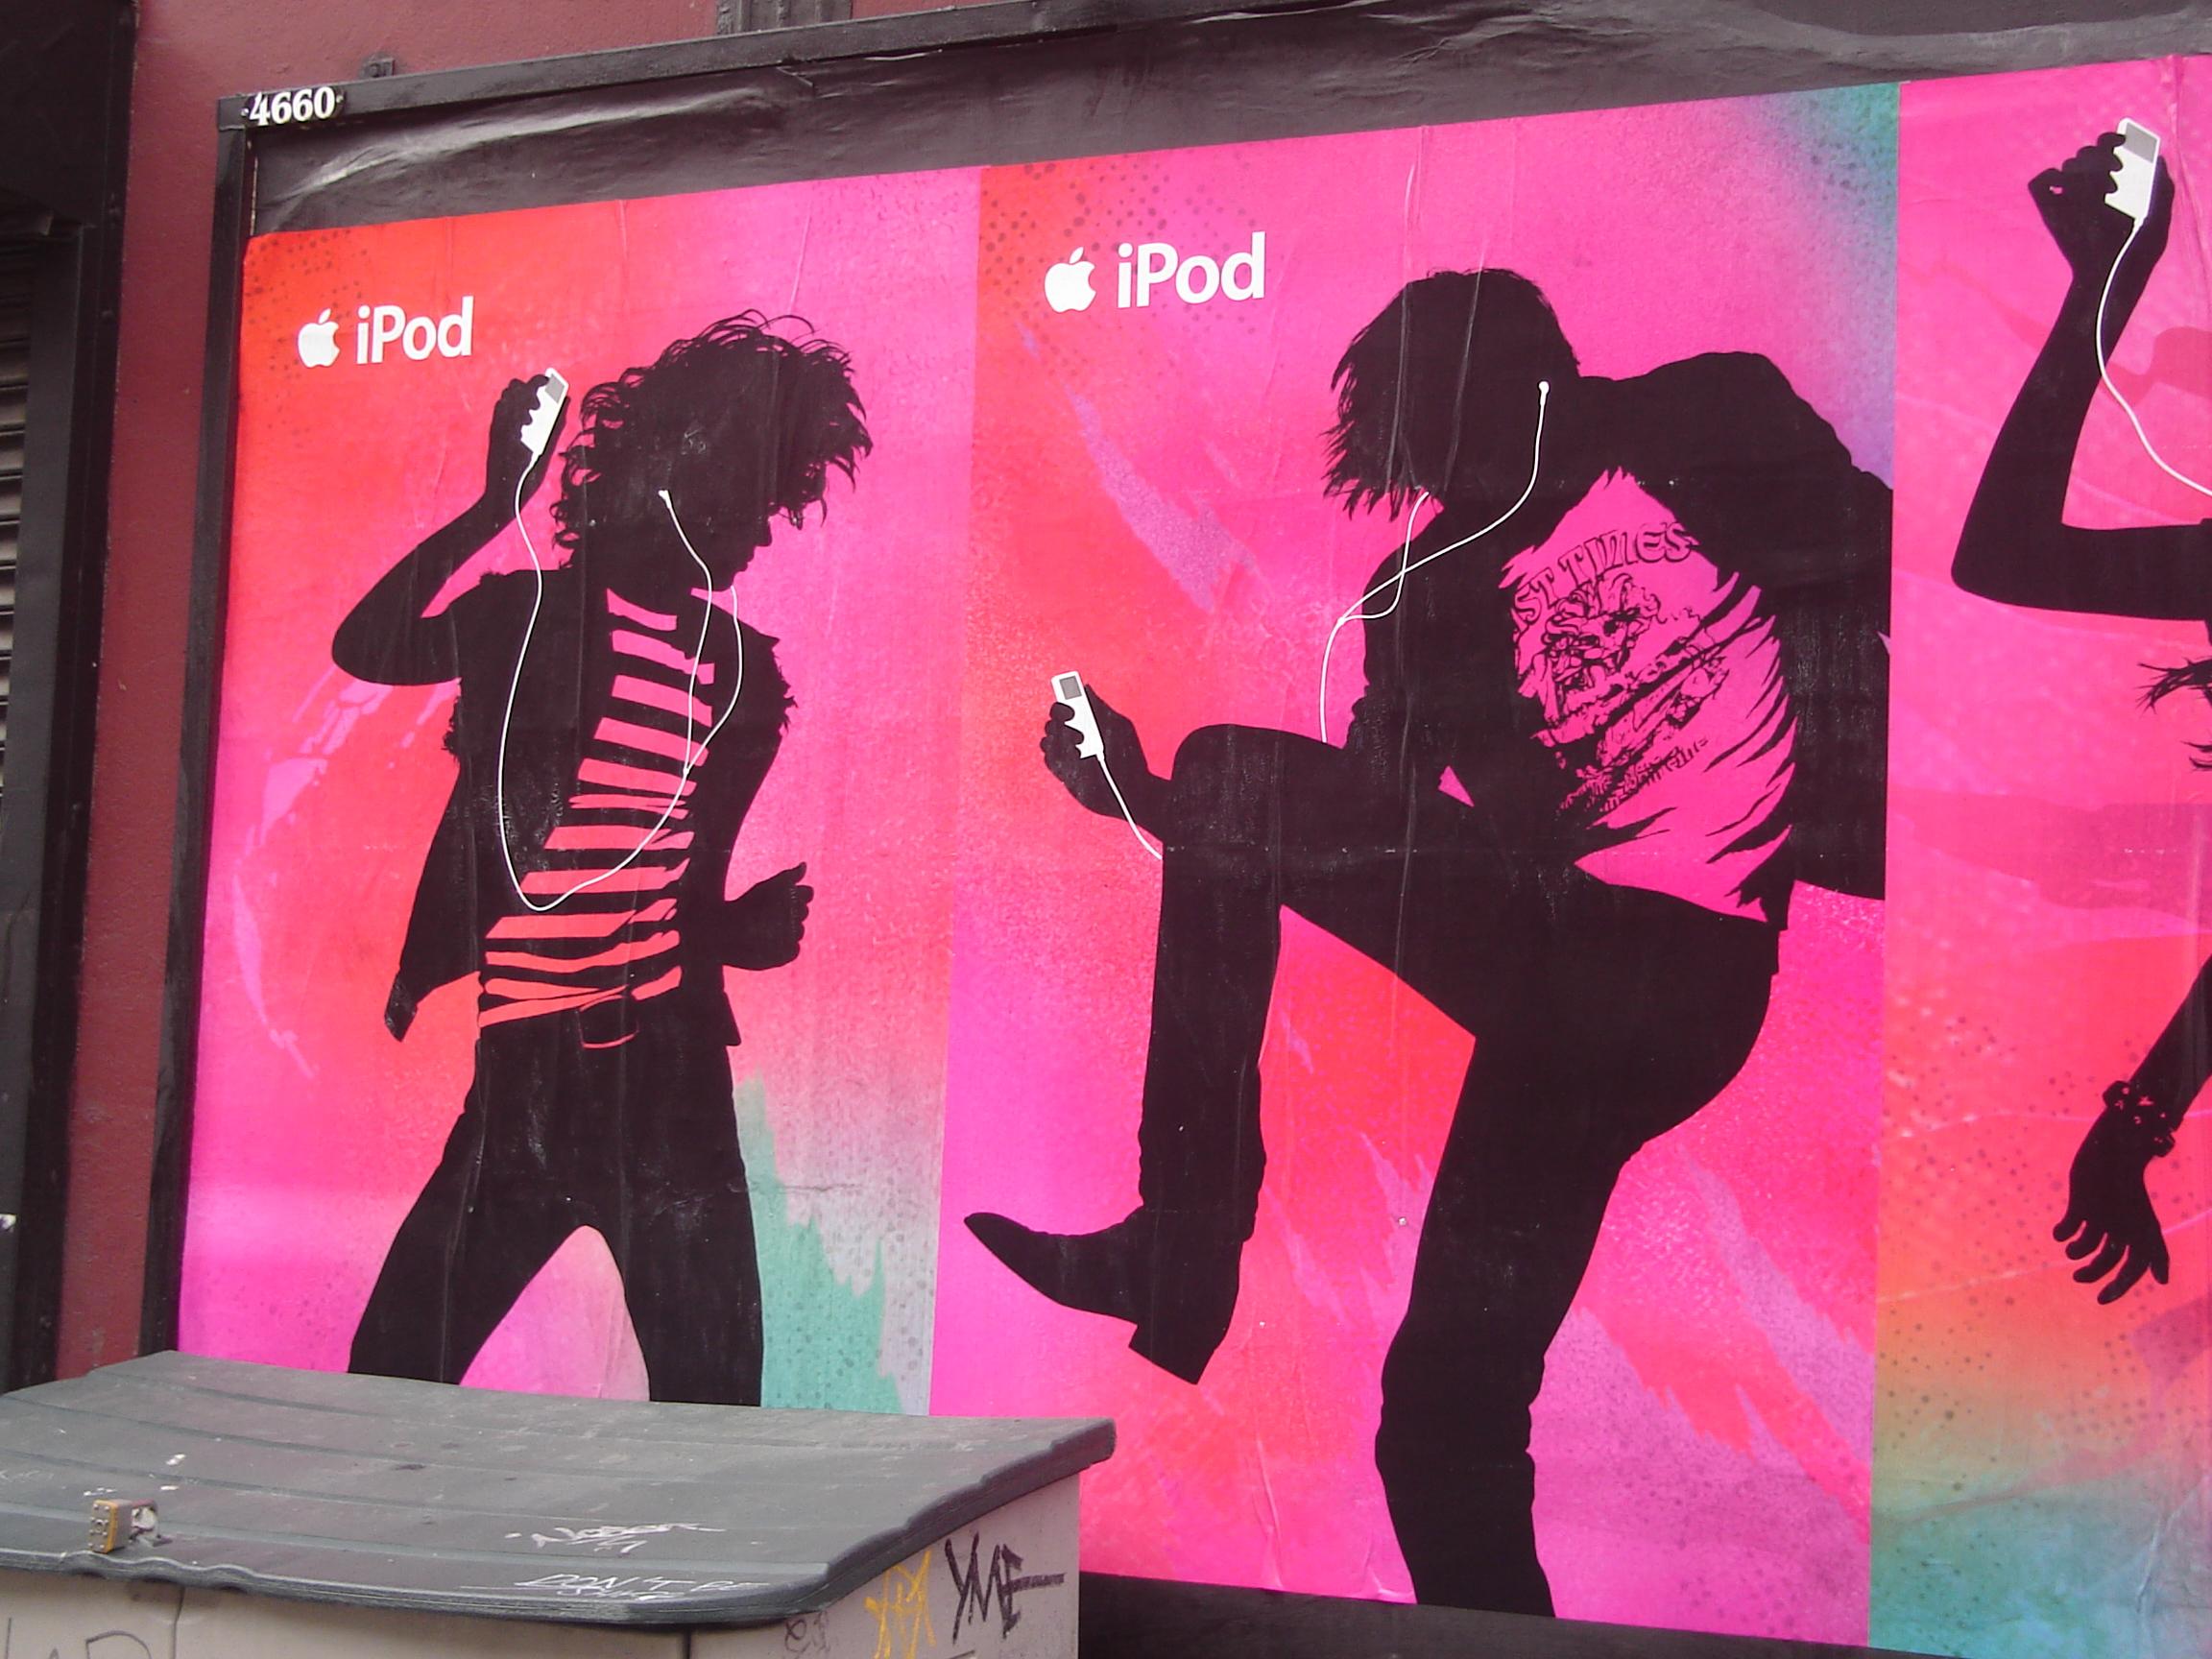 iPod street ads